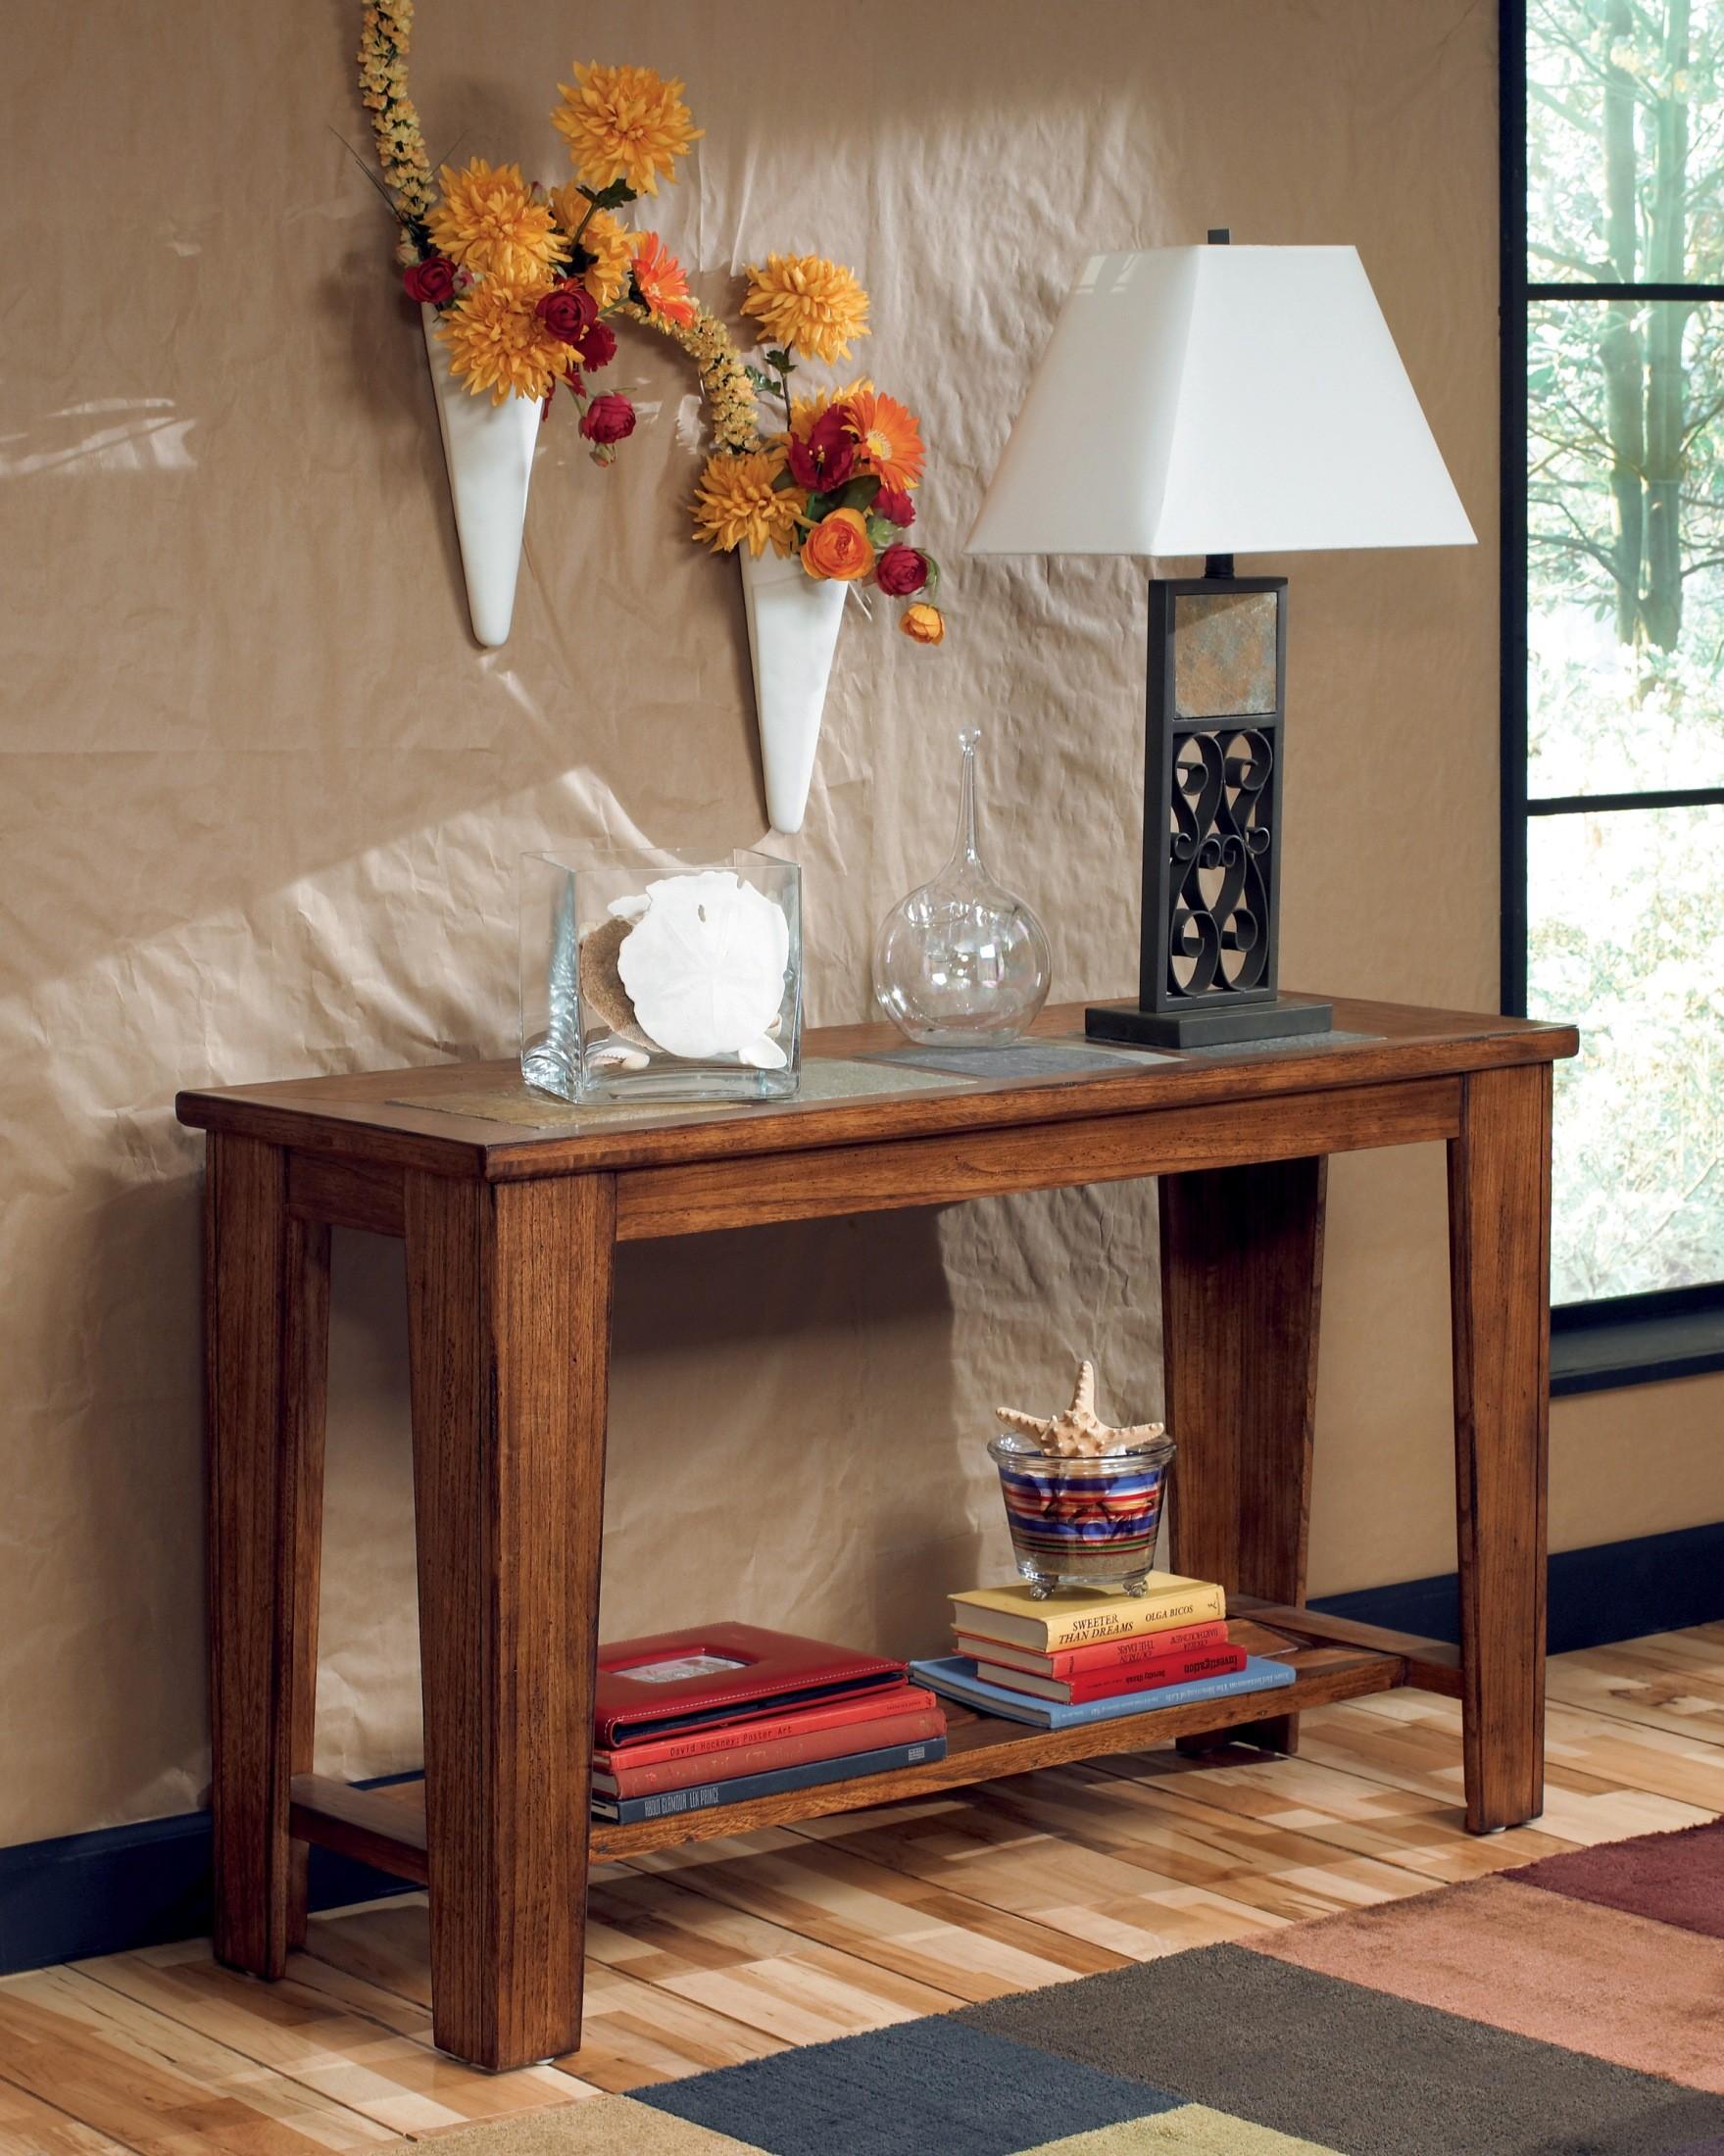 Toscana Sofa Table From Ashley (T353-4)